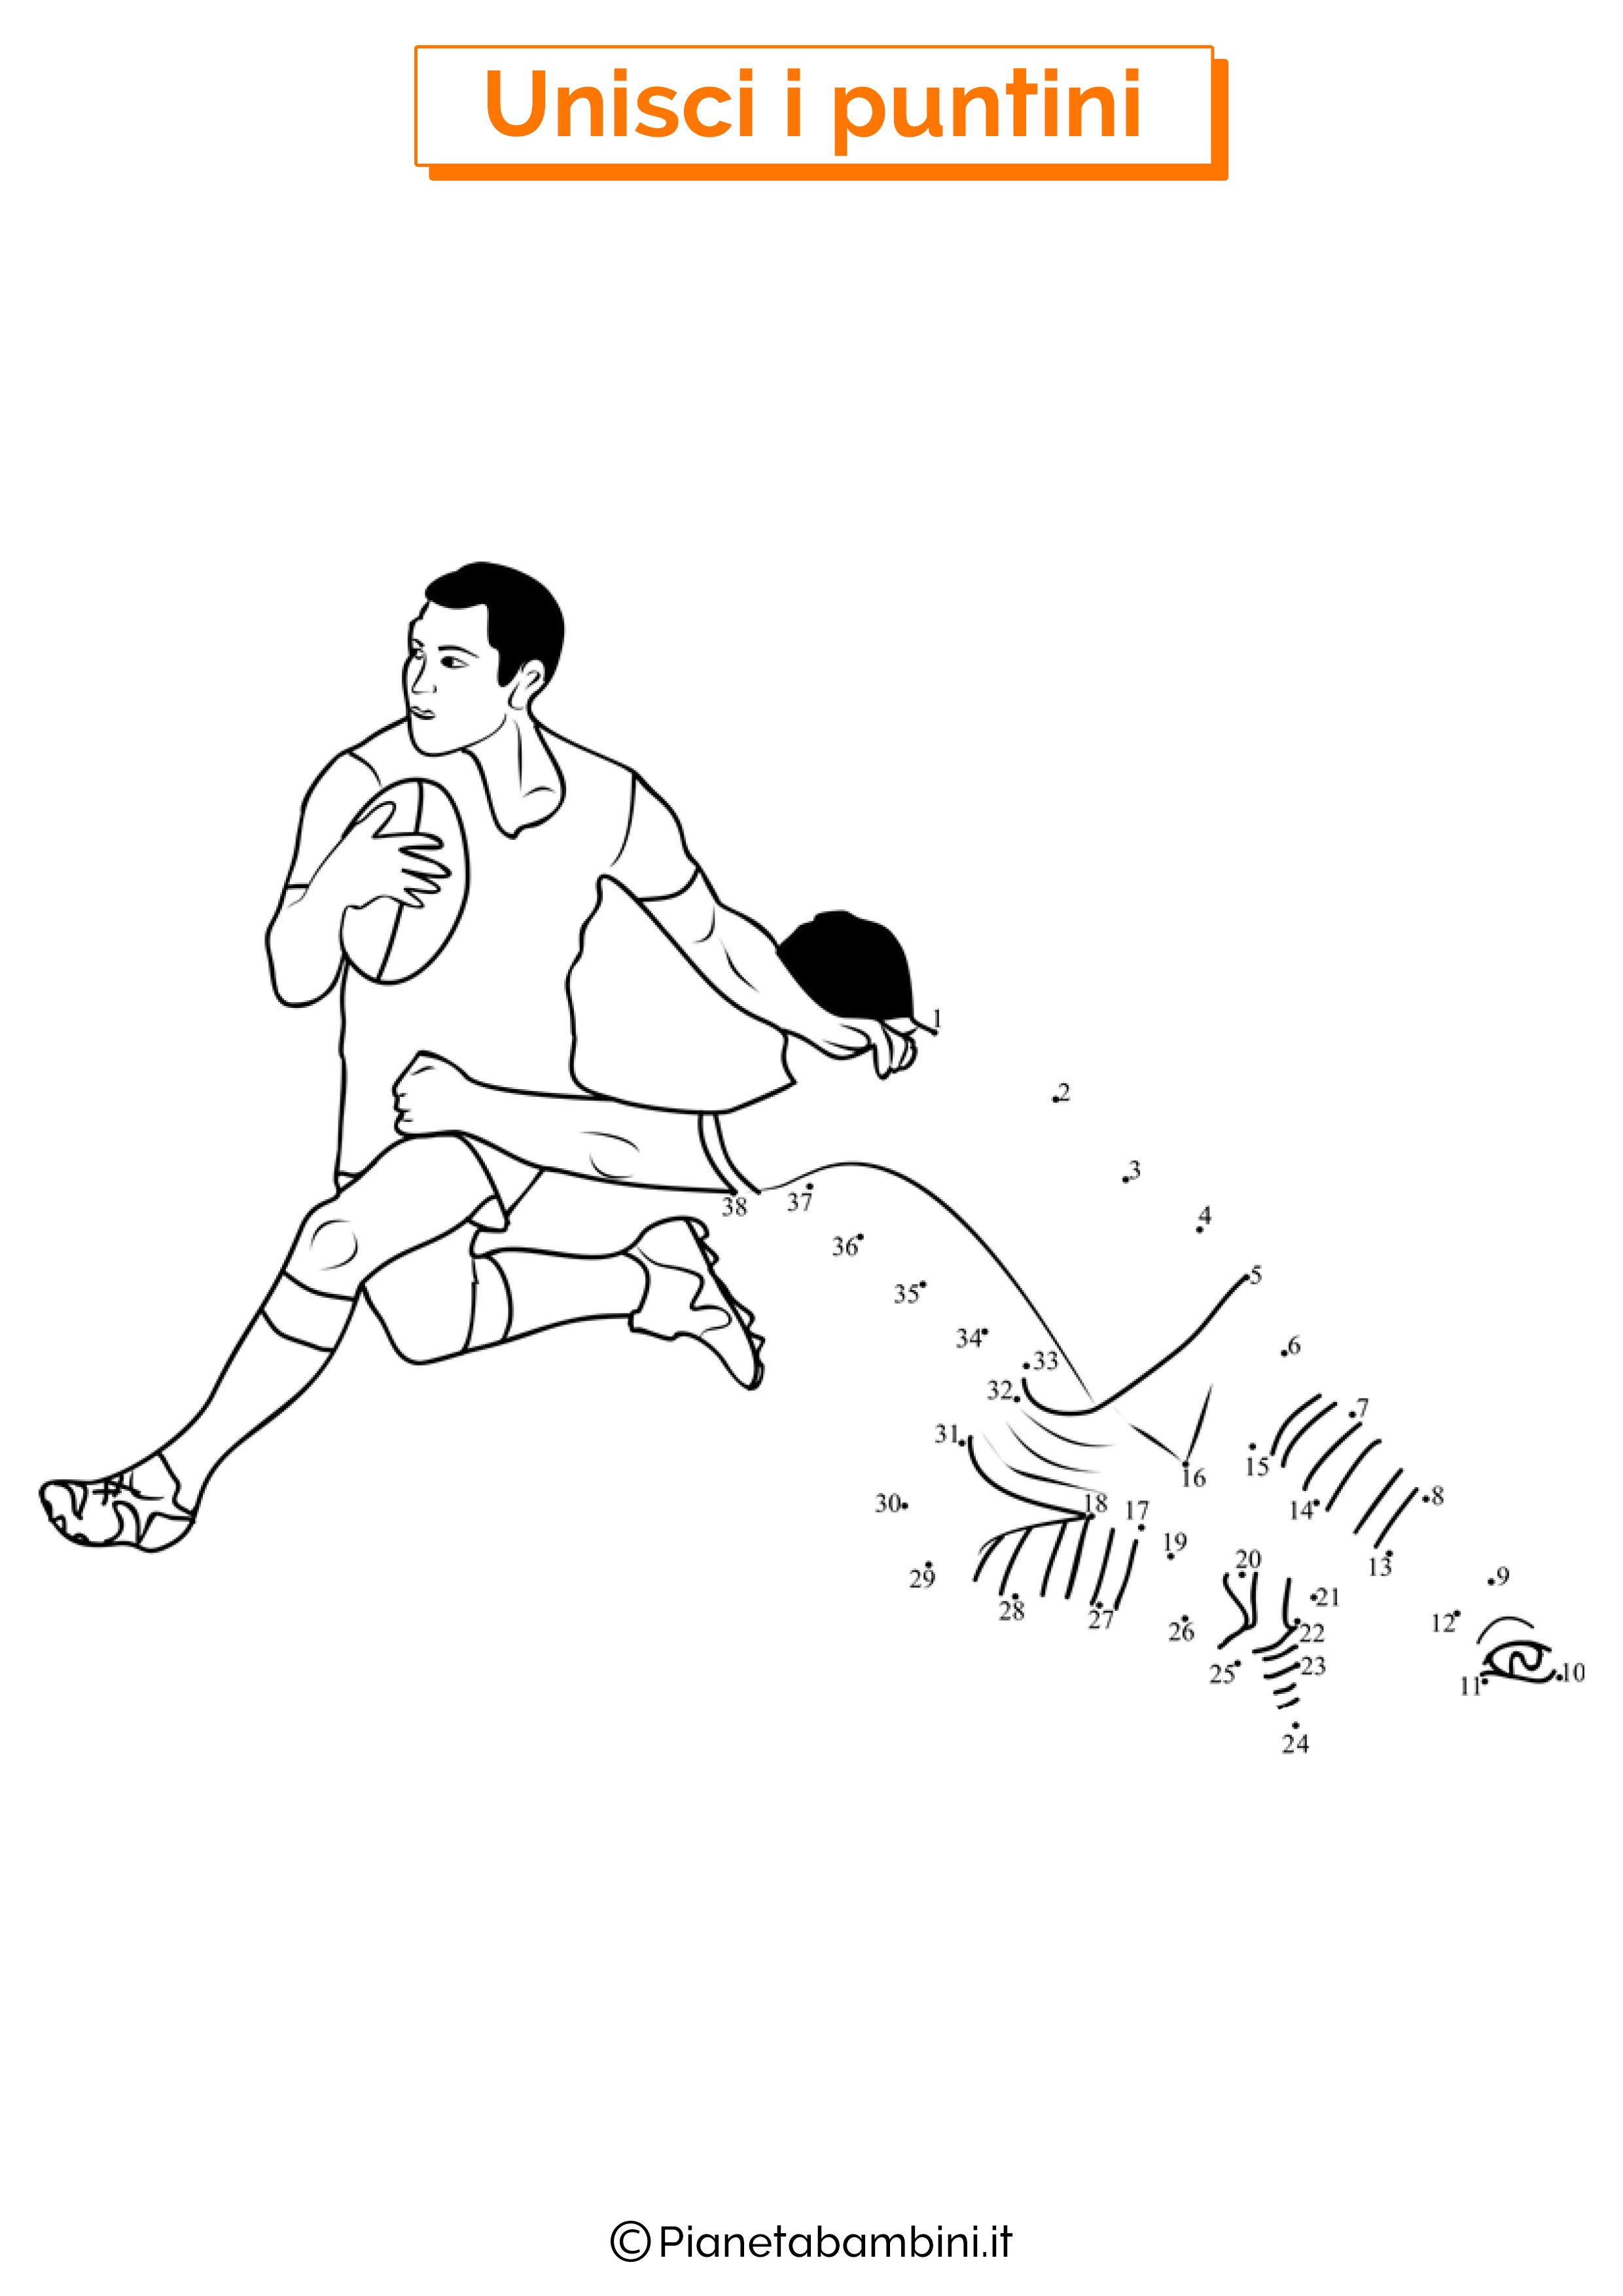 Disegno unisci i puntini rugby